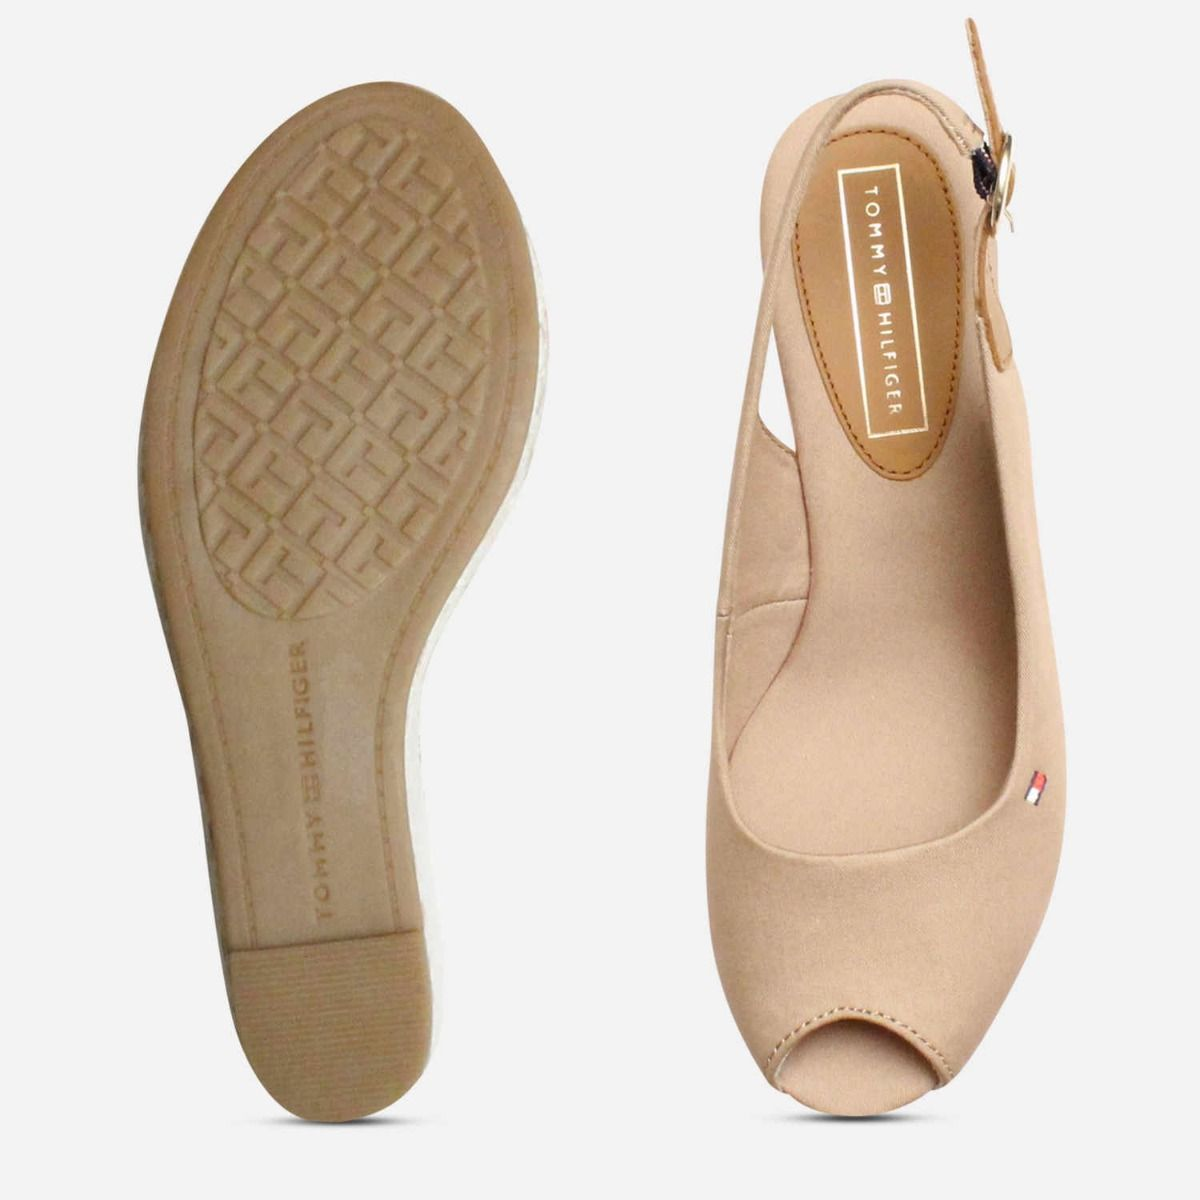 Tommy Hilfiger Womens Elba Cobblestone Sling Back Sandals